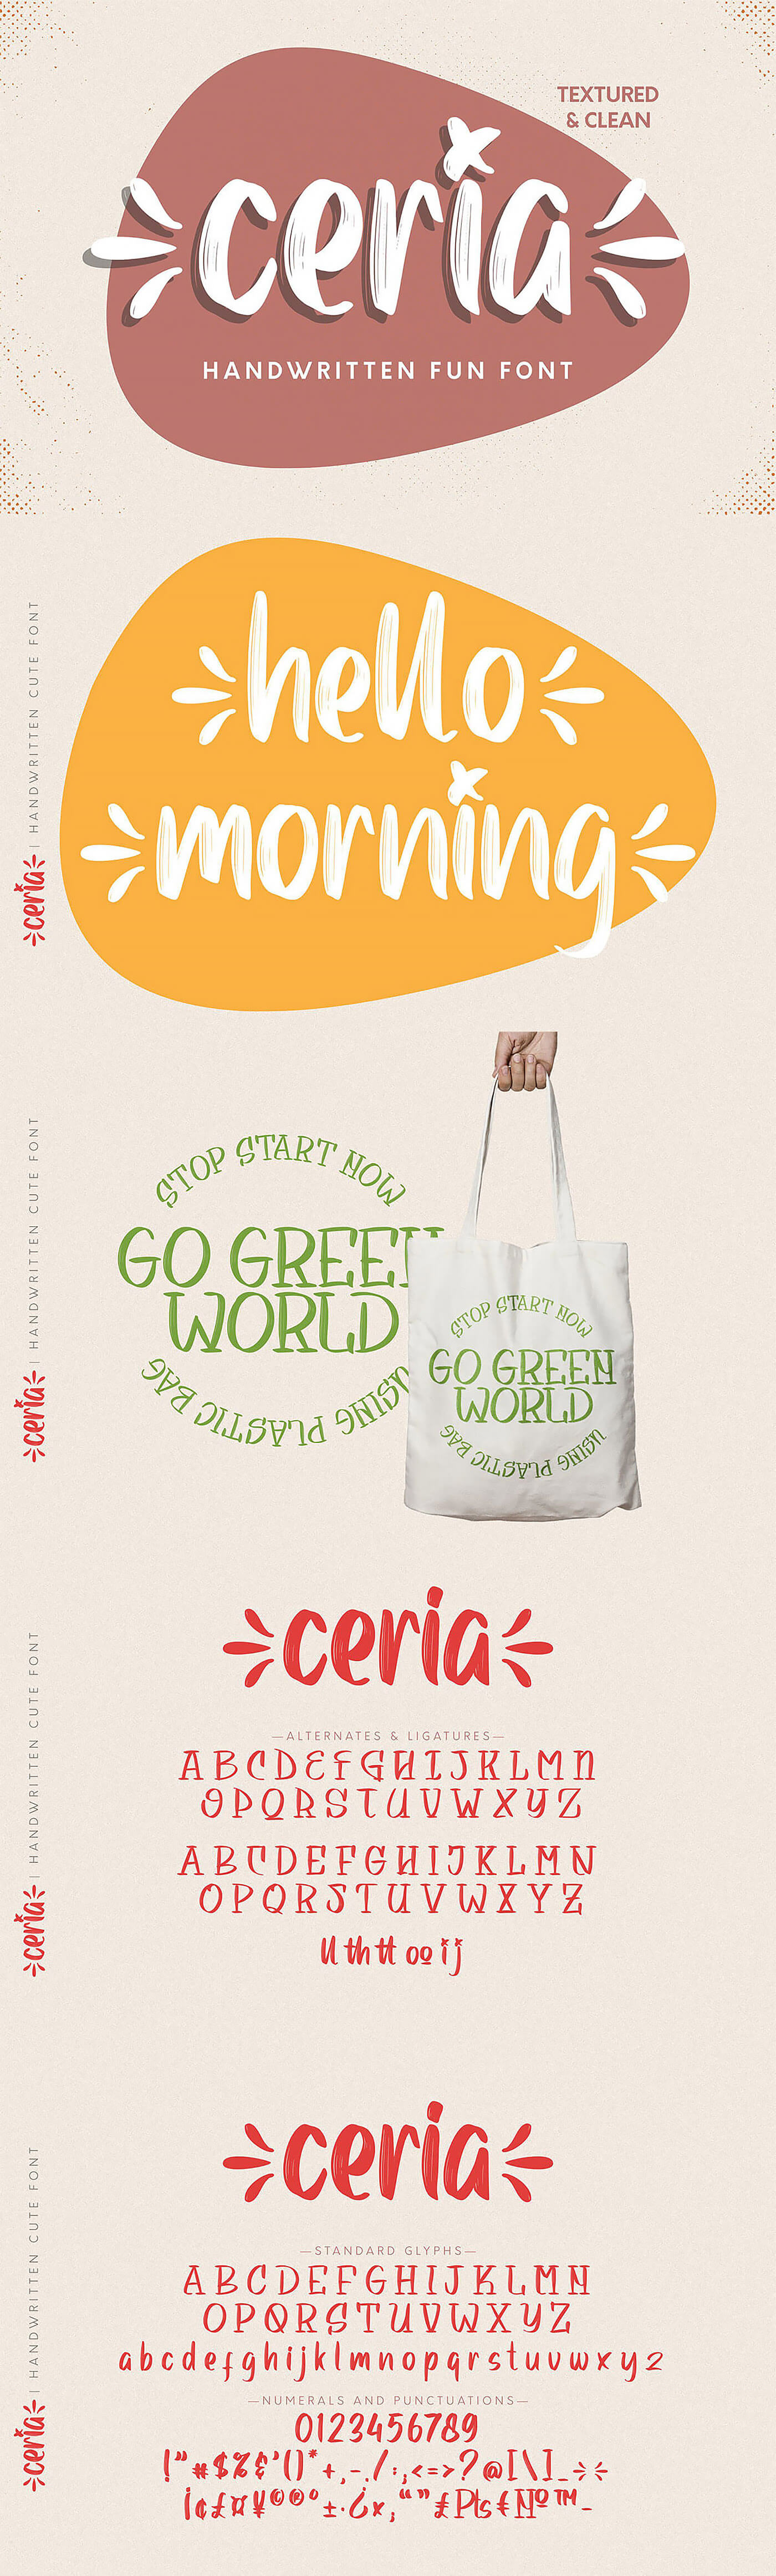 Free Ceria Handwritten Font